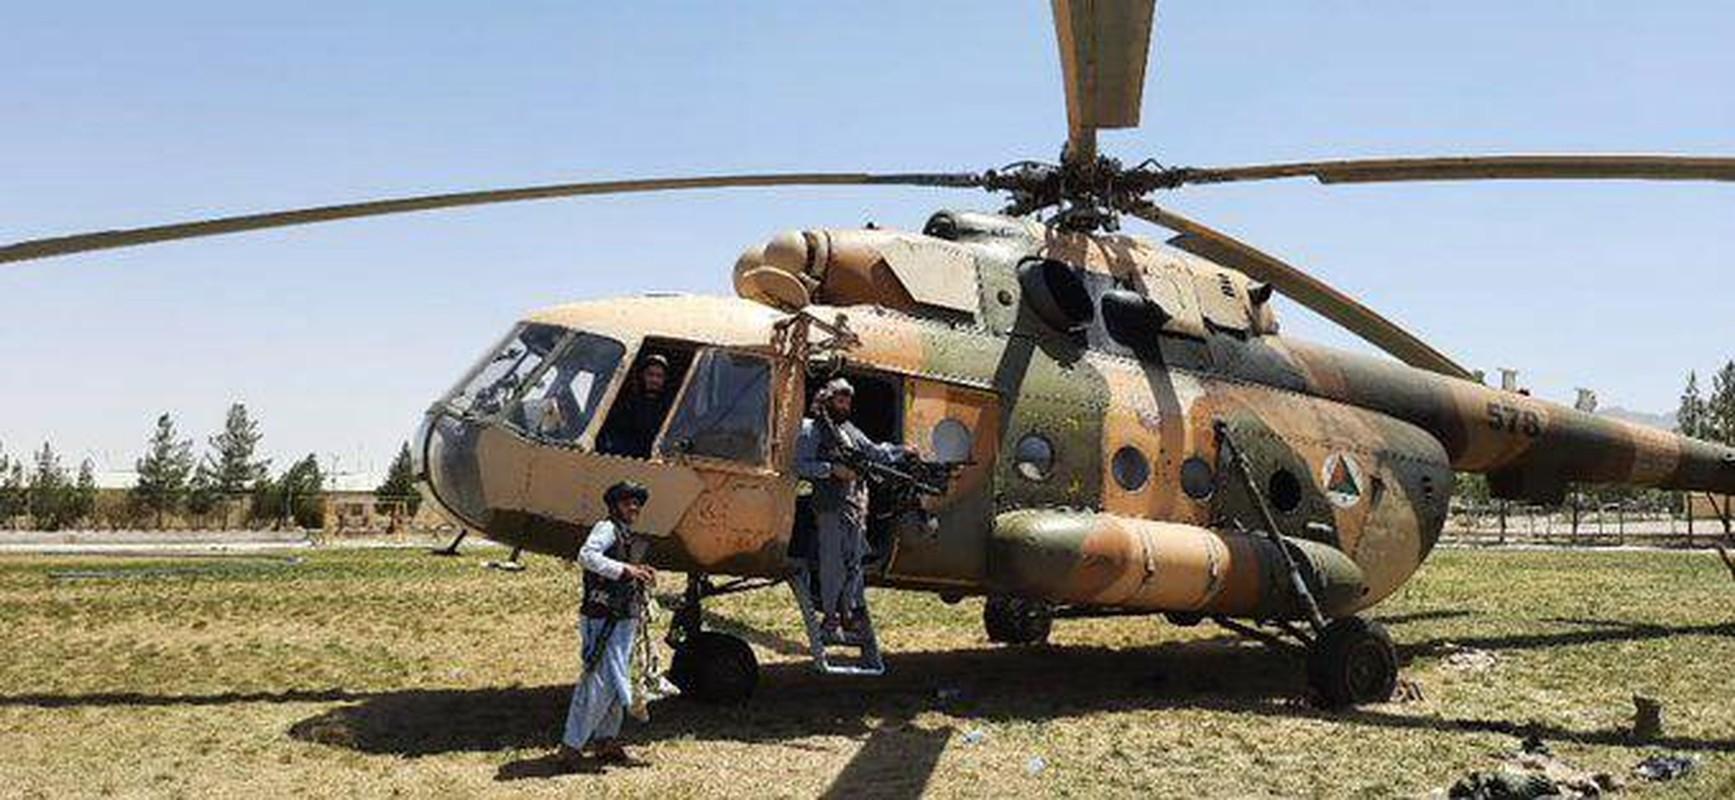 Tai sao quan Taliban kho pha vo vong vay tai thung lung Panjshir?-Hinh-20